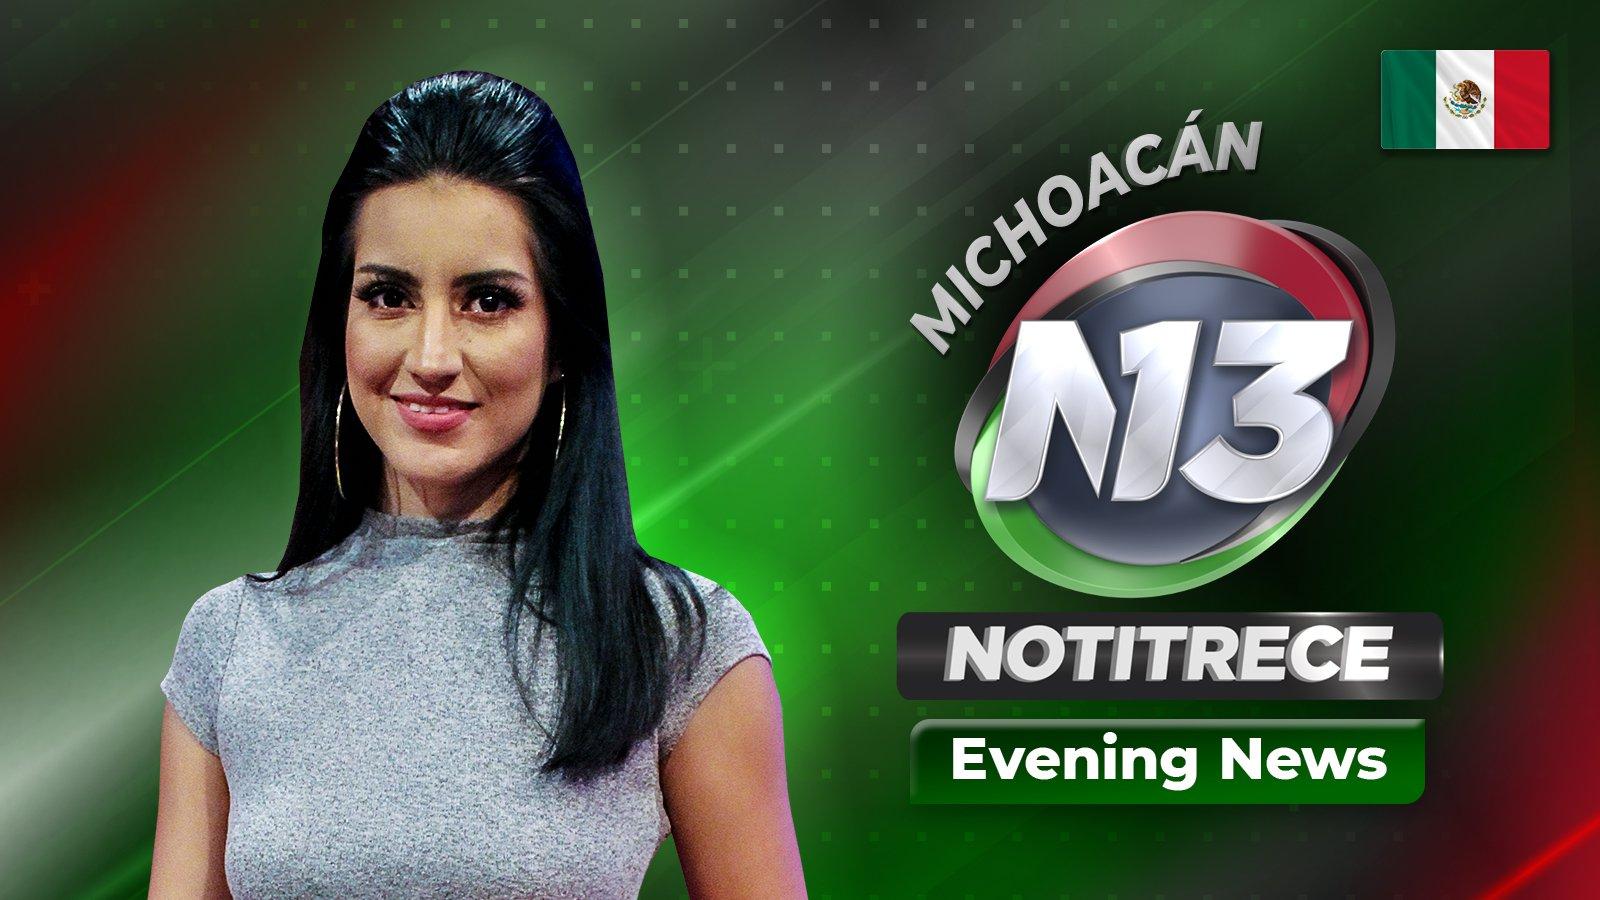 Evening Noti13 Michoacán poster